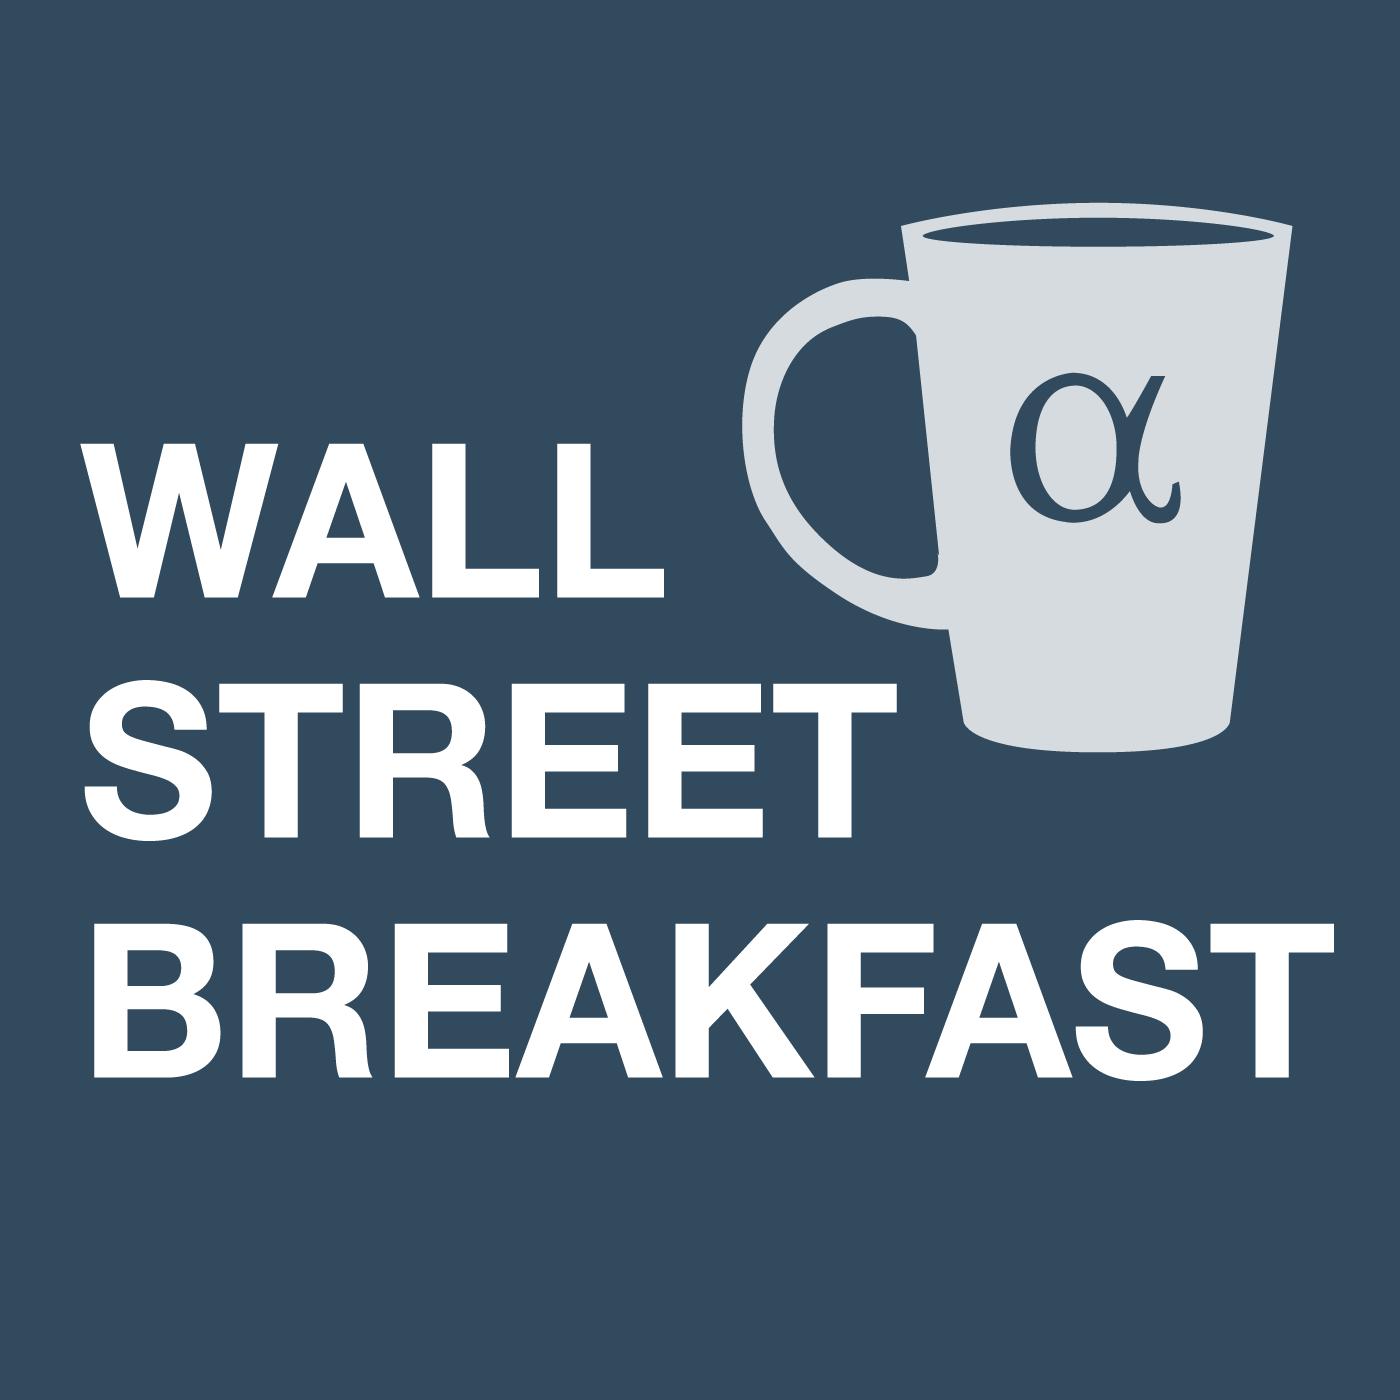 Wall Street Breakfast May 9: Rideshare Rebound, Apparel Picks, Dogecoin Mojo